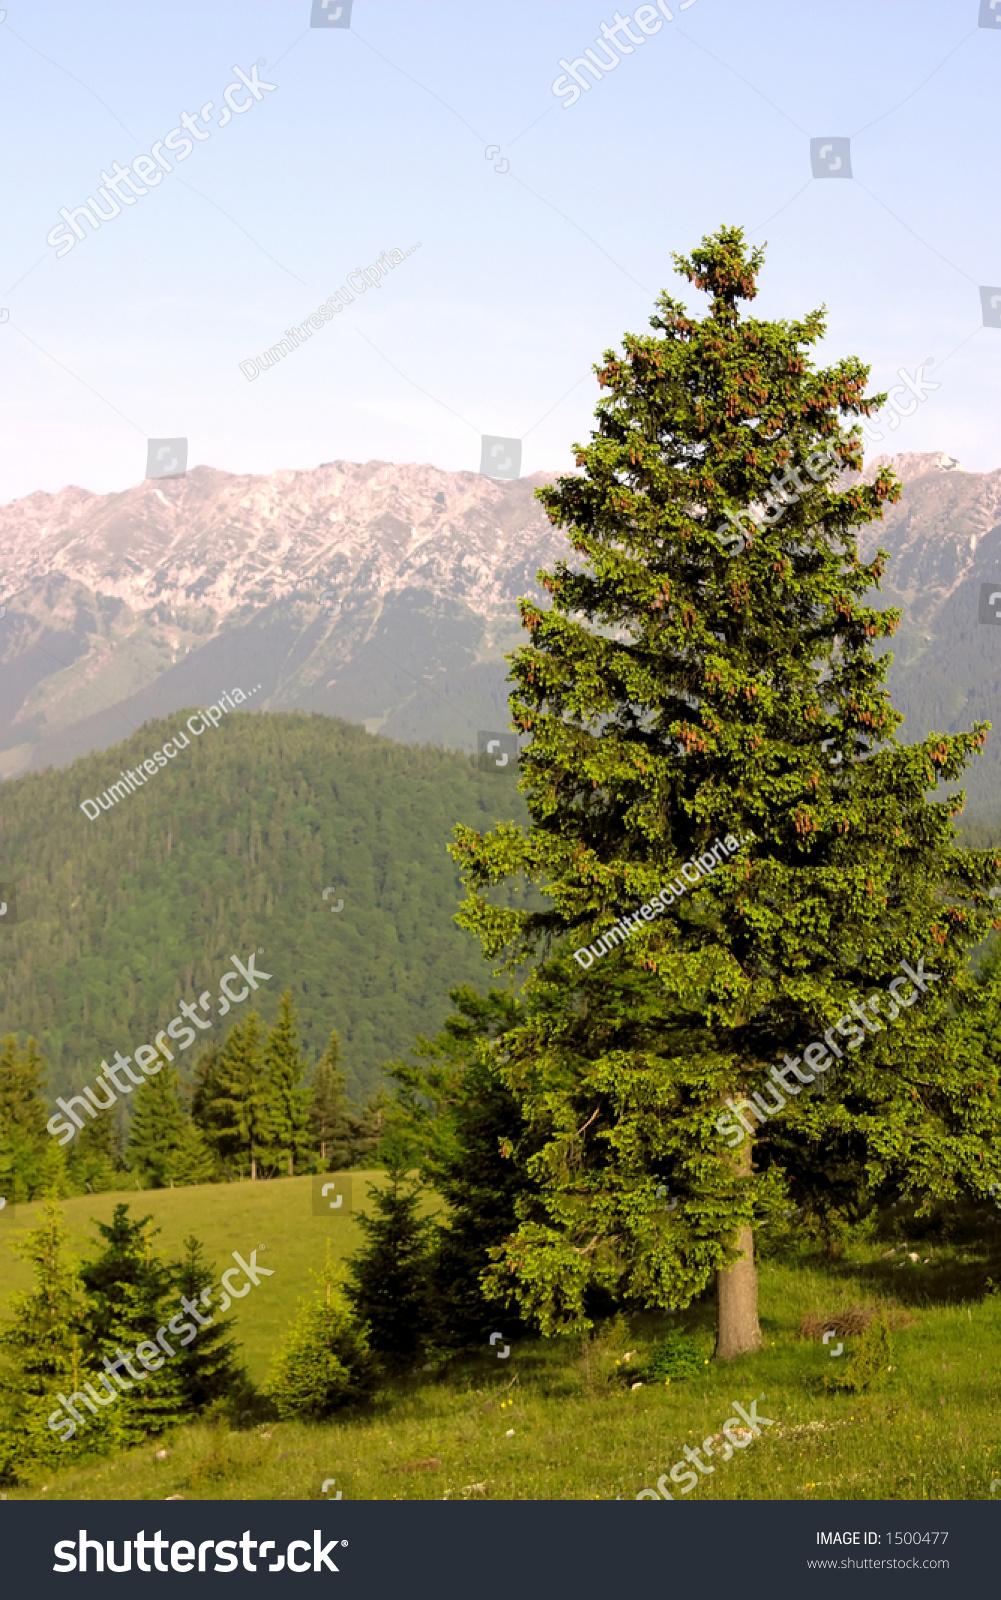 Must see Wallpaper Mountain Portrait - stock-photo-fir-on-mountain-portrait-wallpaper-1500477  Pic_254915.jpg